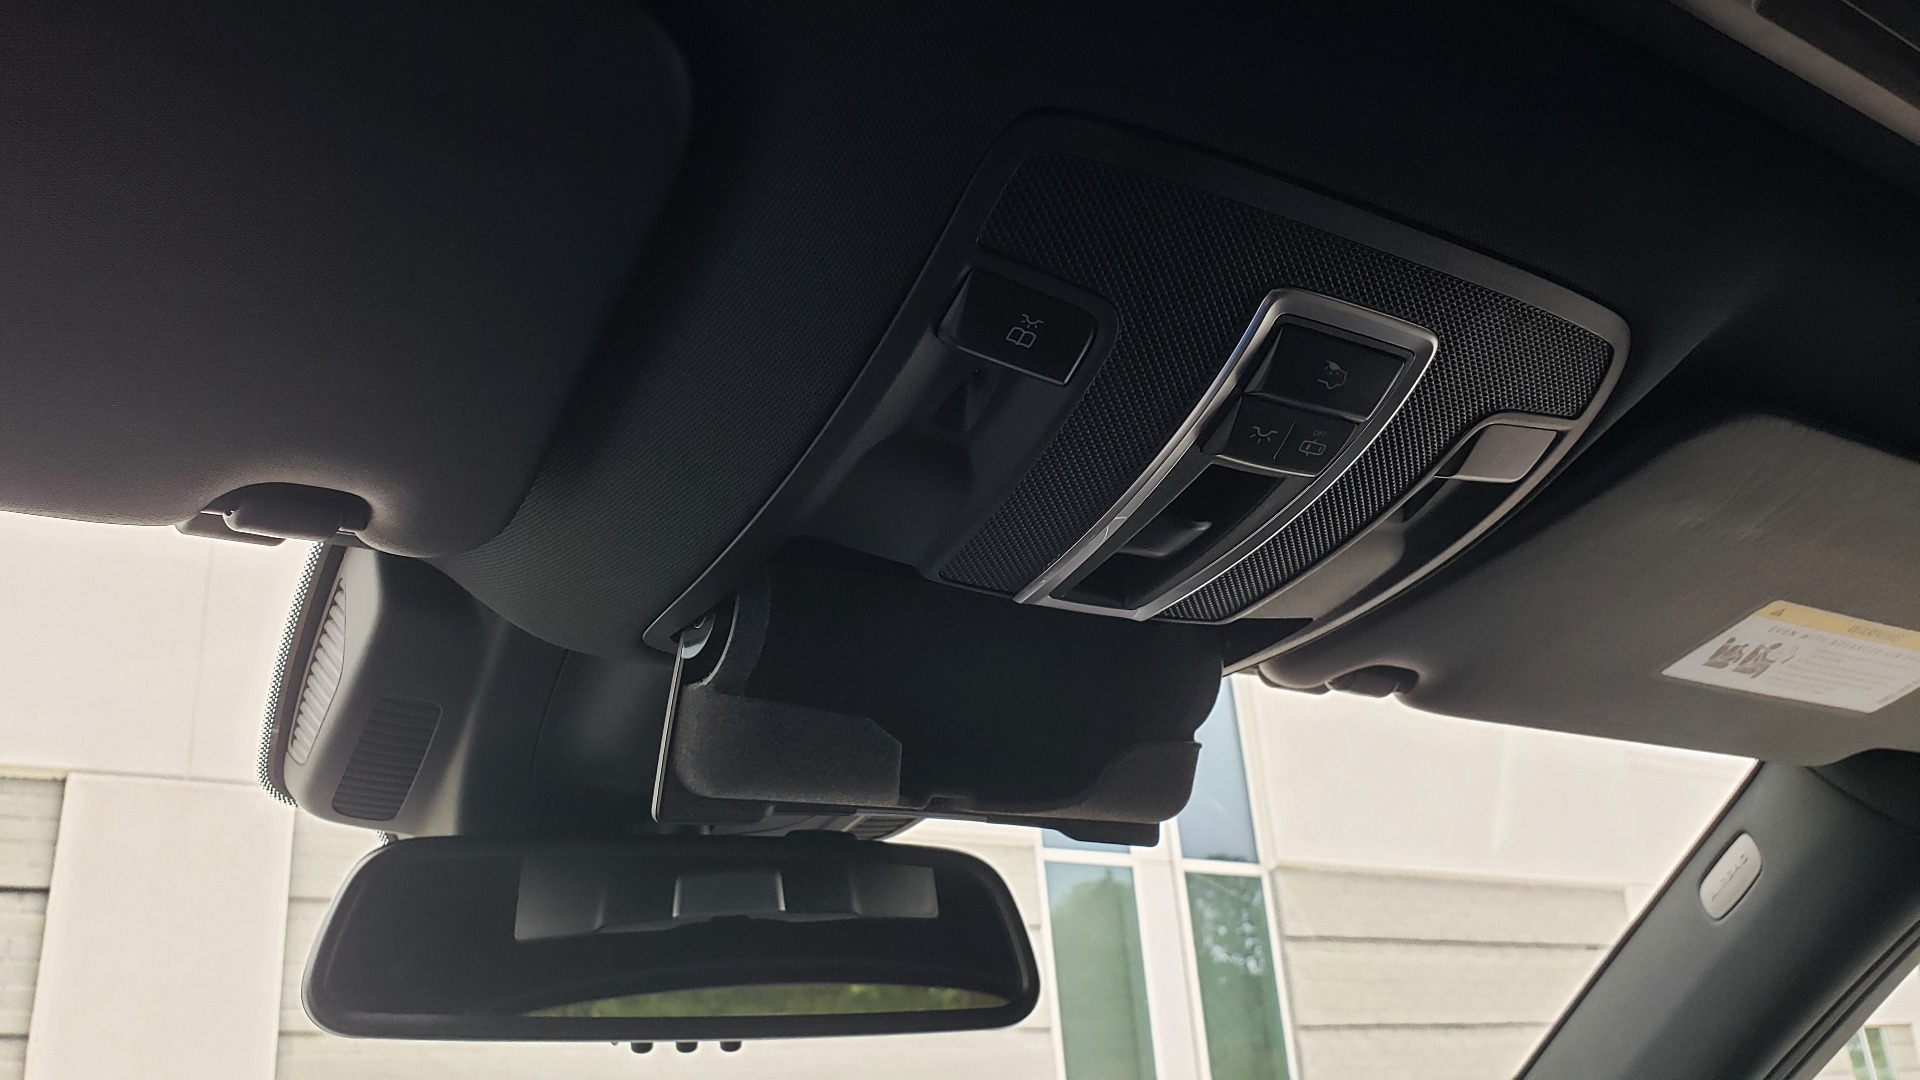 Used 2018 Mercedes-Benz GLE 350 4MATIC / PREM PKG / NAV / PARK ASST / K/H SND / HITCH / REARVIEW for sale $40,801 at Formula Imports in Charlotte NC 28227 56